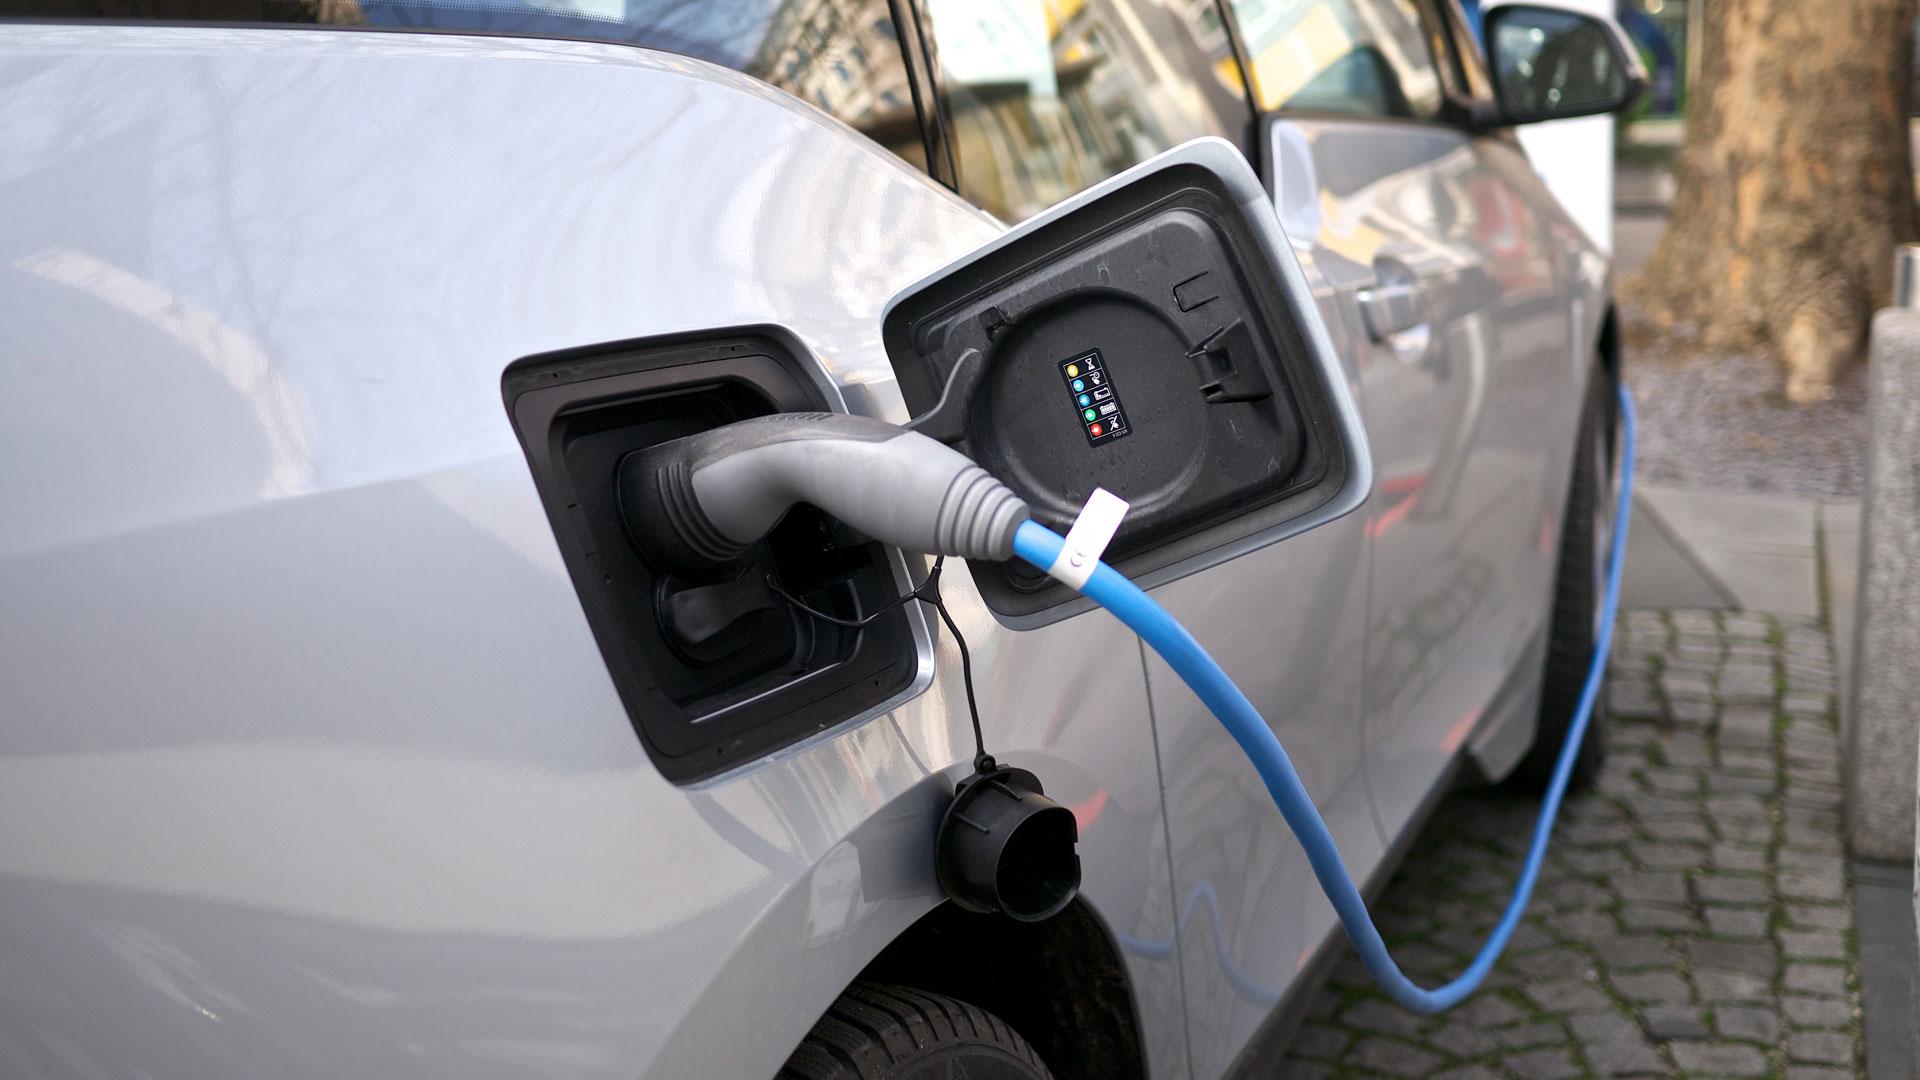 ev Car charge 1